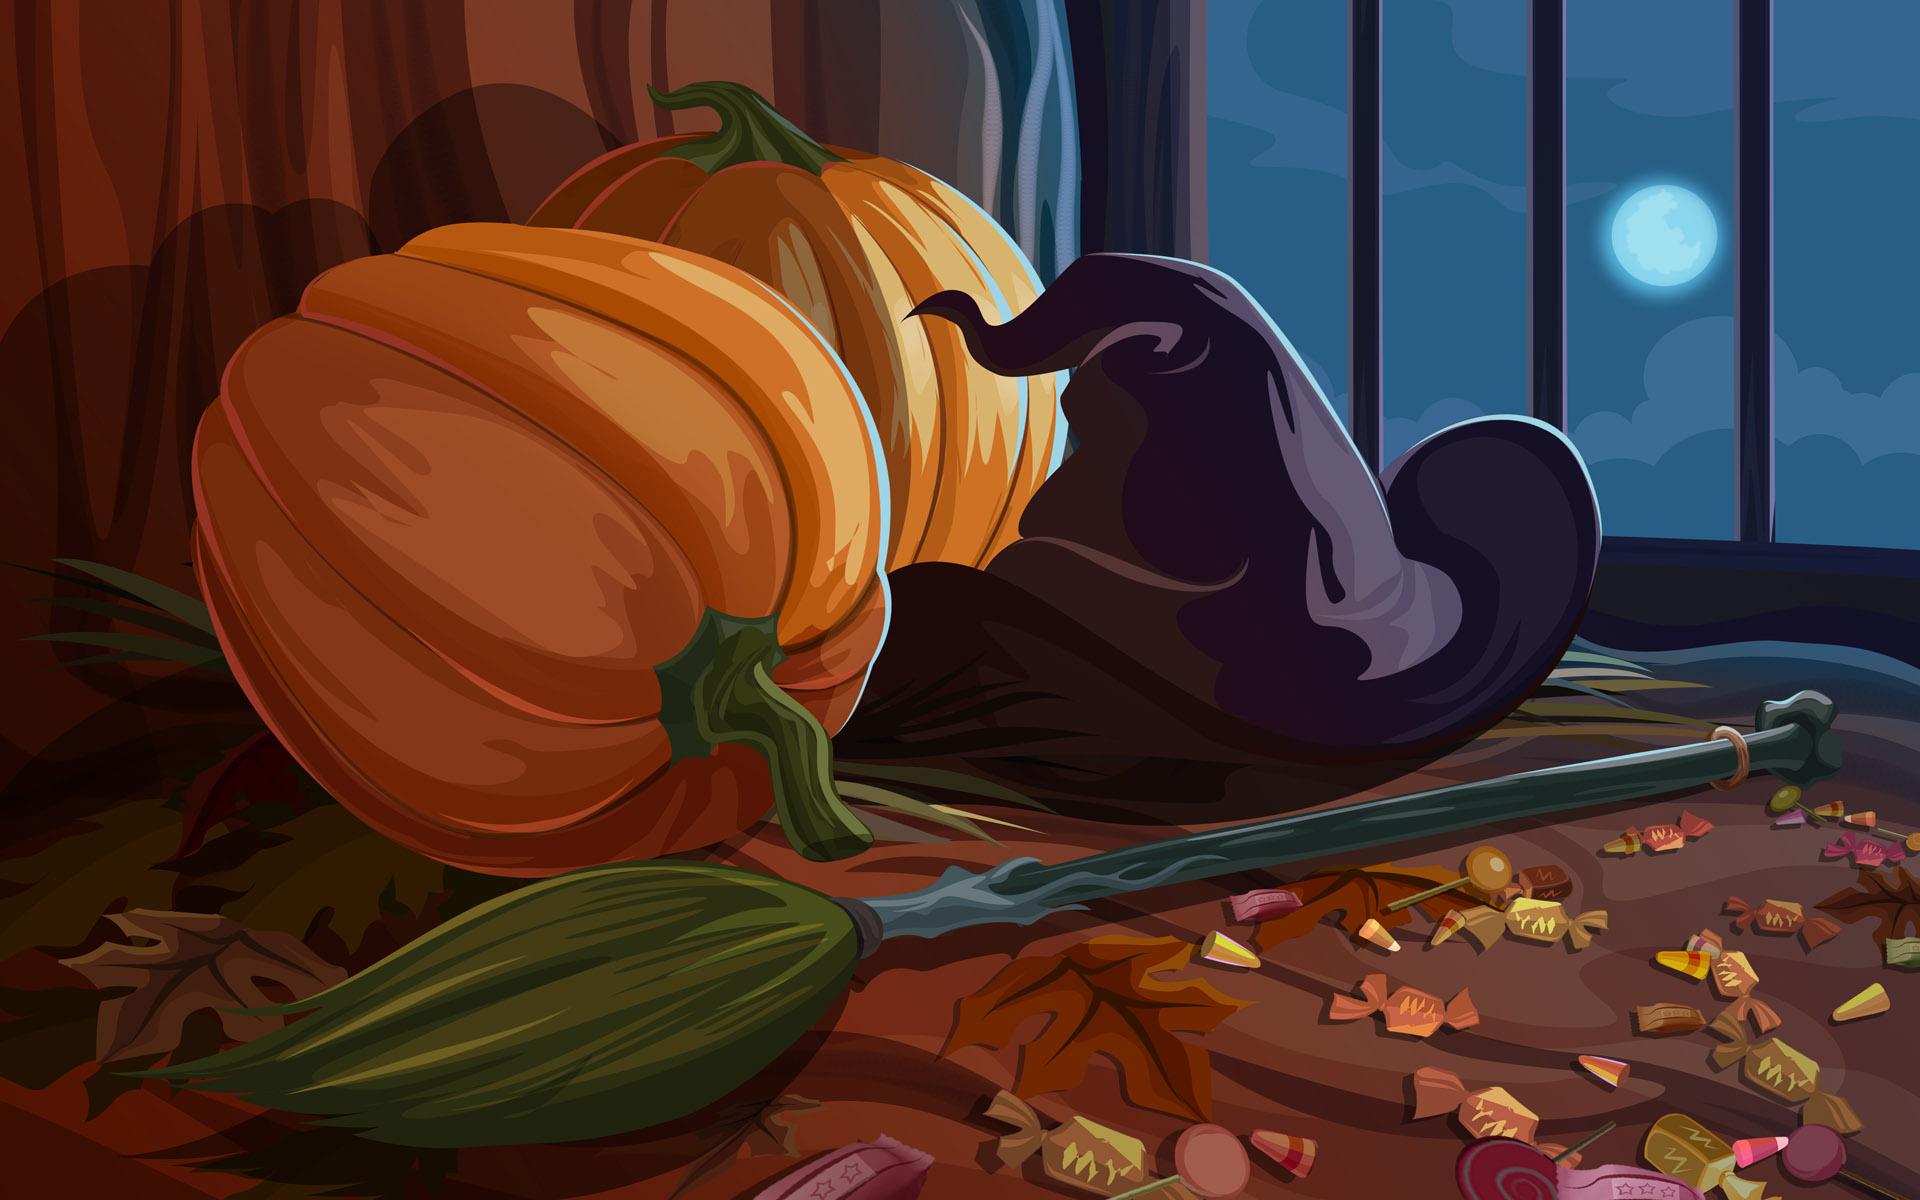 wallpapers desktop screen saver screensavers witch halloween 1920x1200